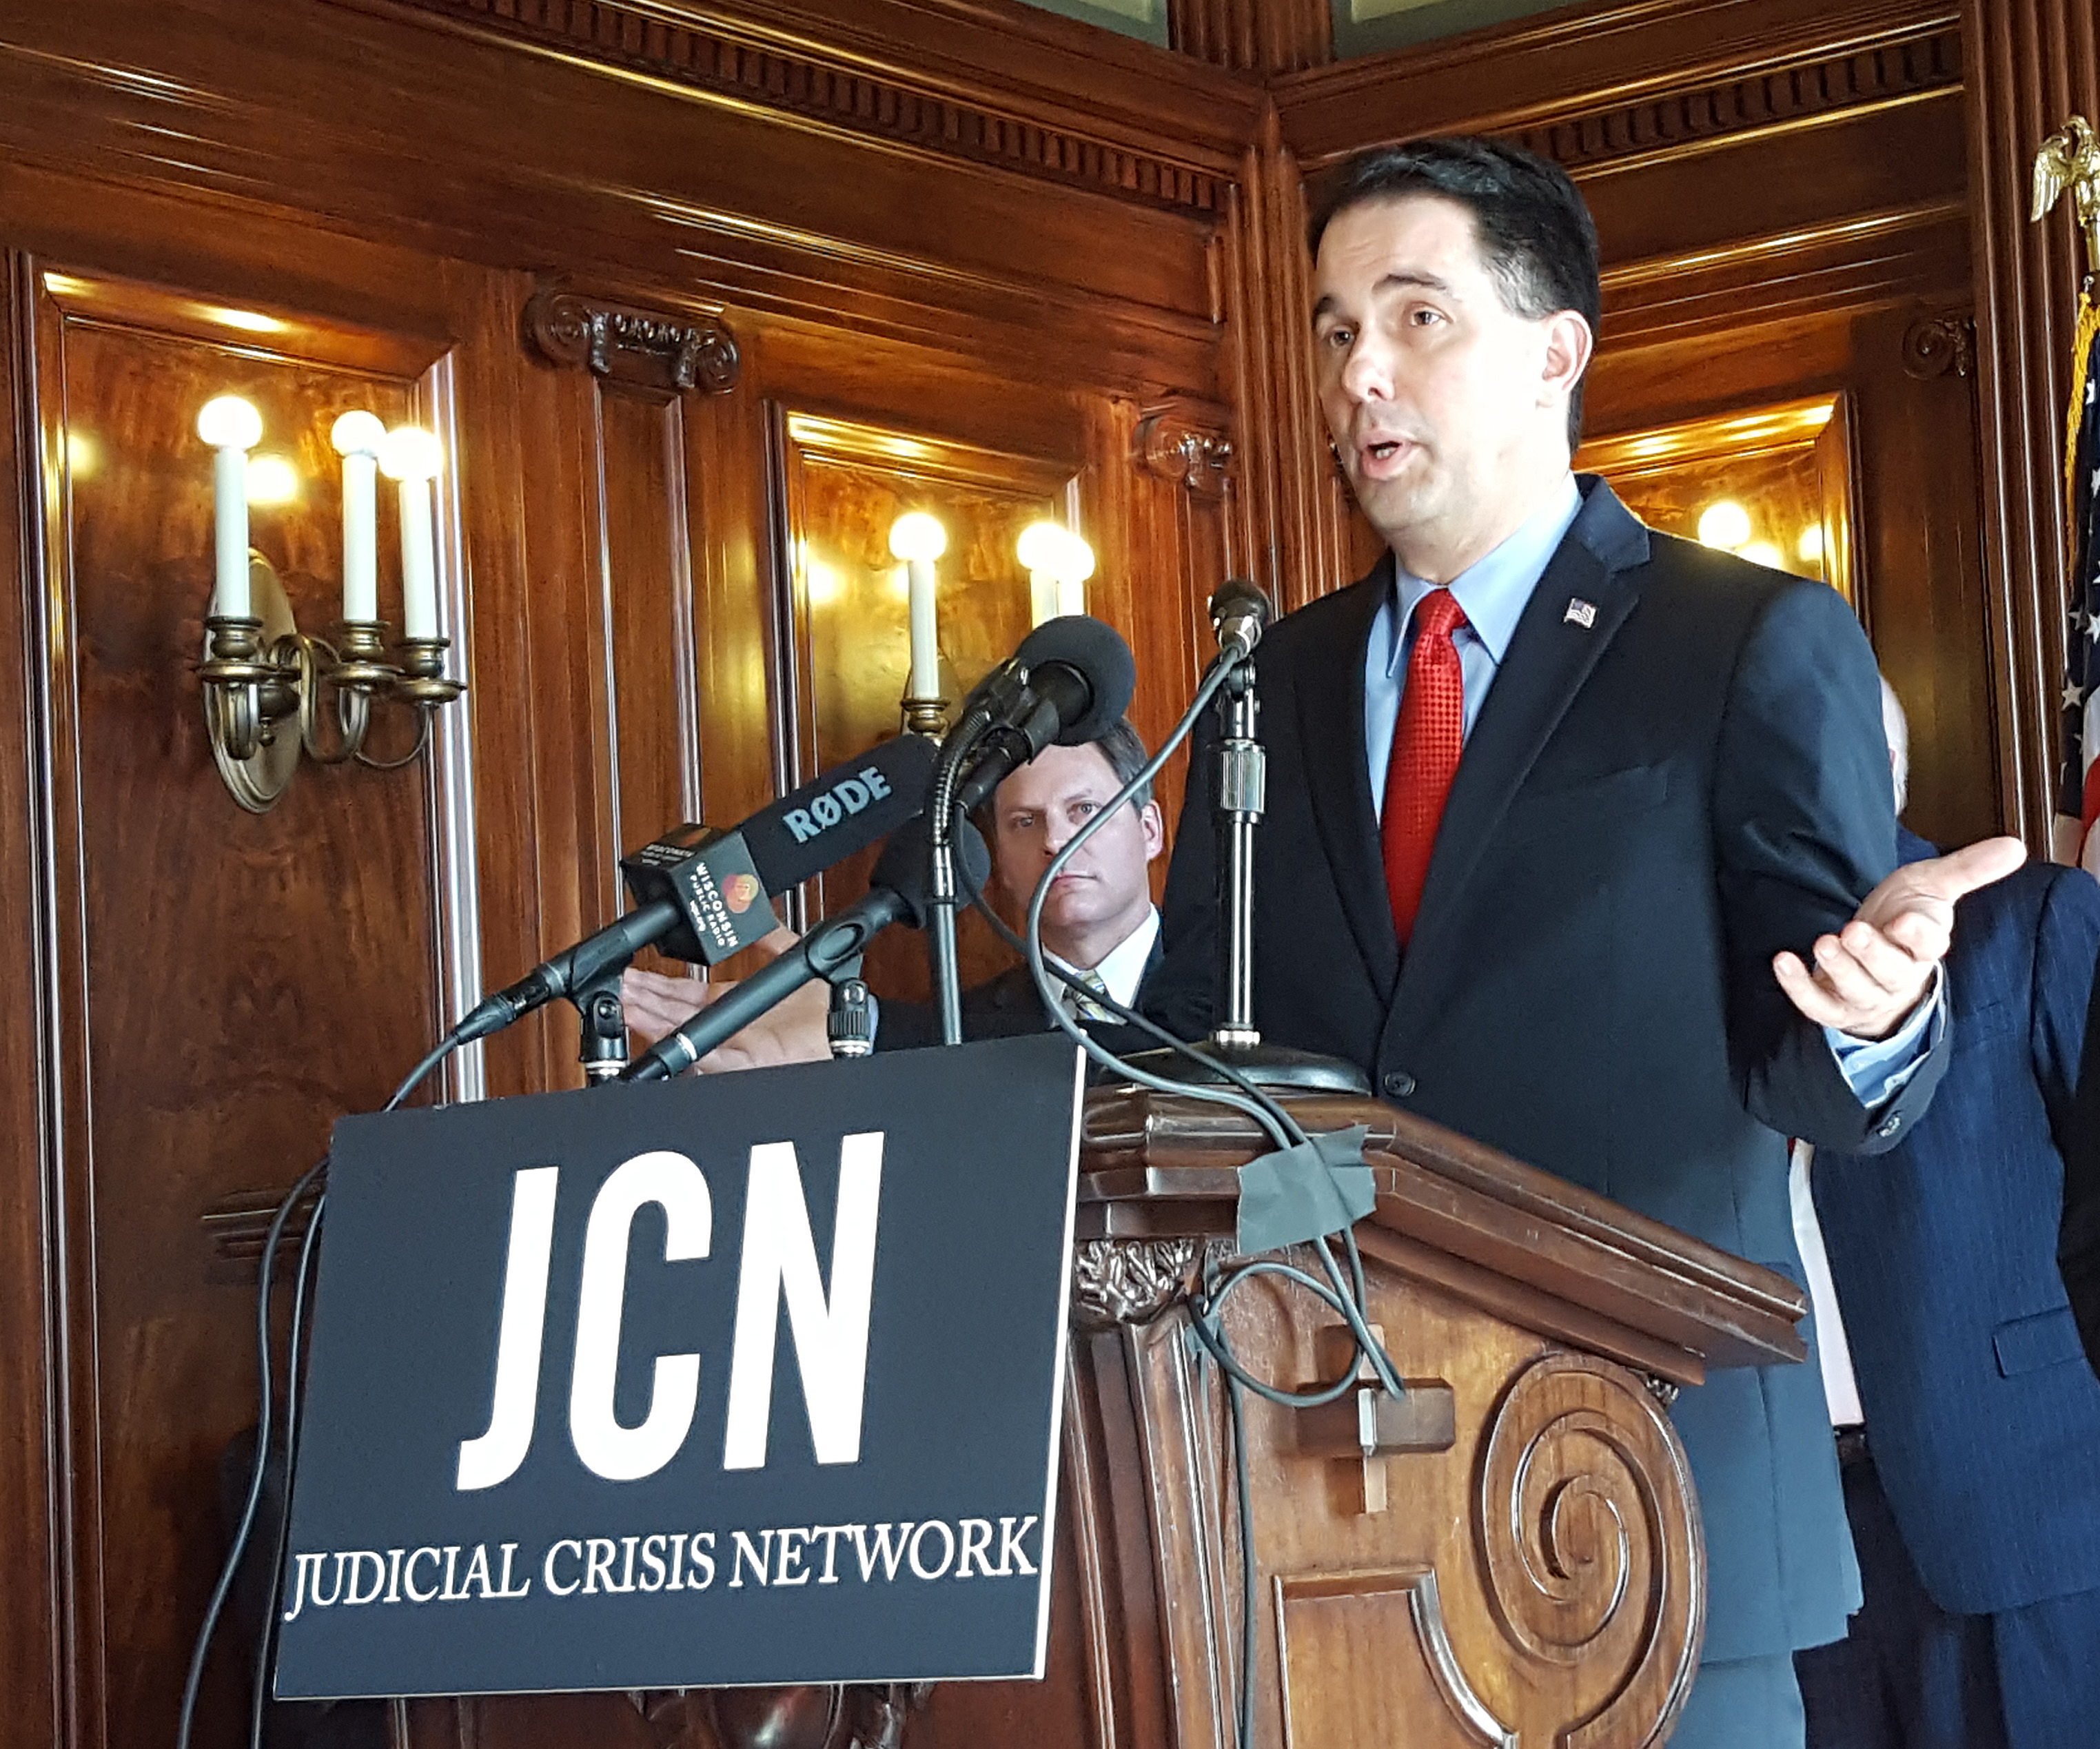 Walker, Schimel call for vote on Trump's Supreme Court nominee